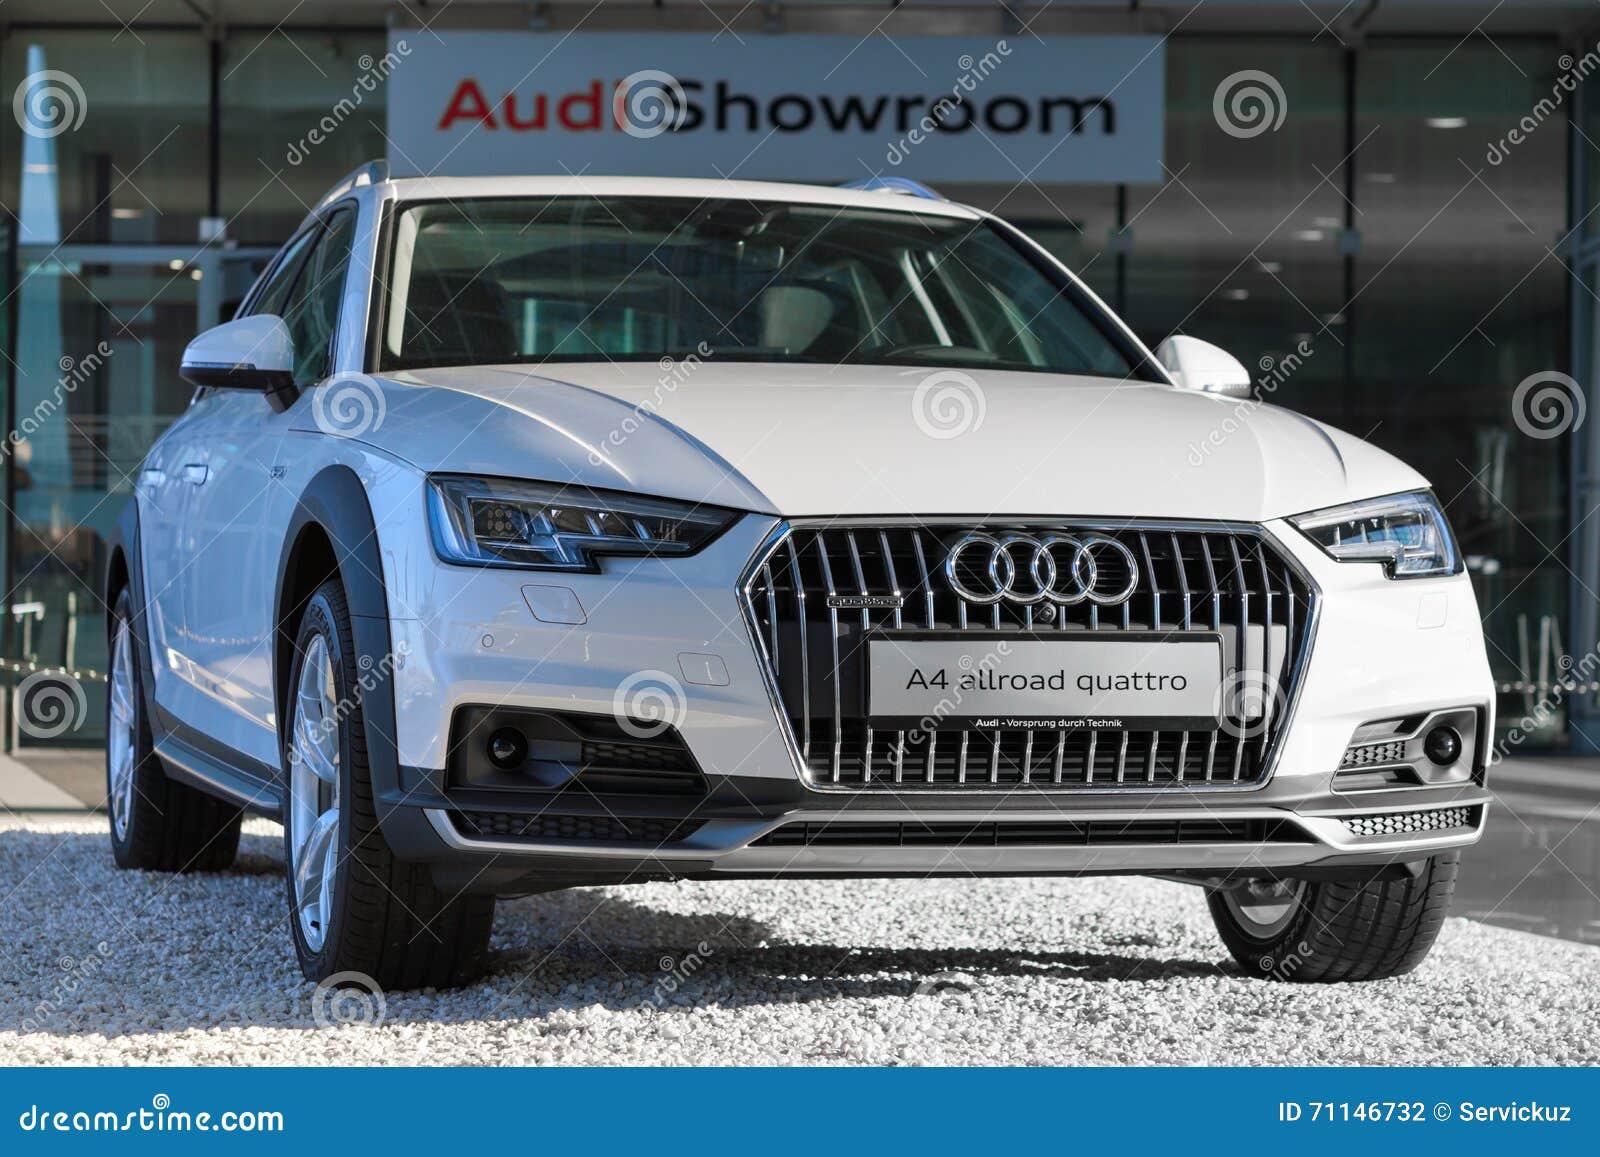 New Model Of WD Crossover Audi A Allroad Quattro Car Editorial - Audi 4wd models